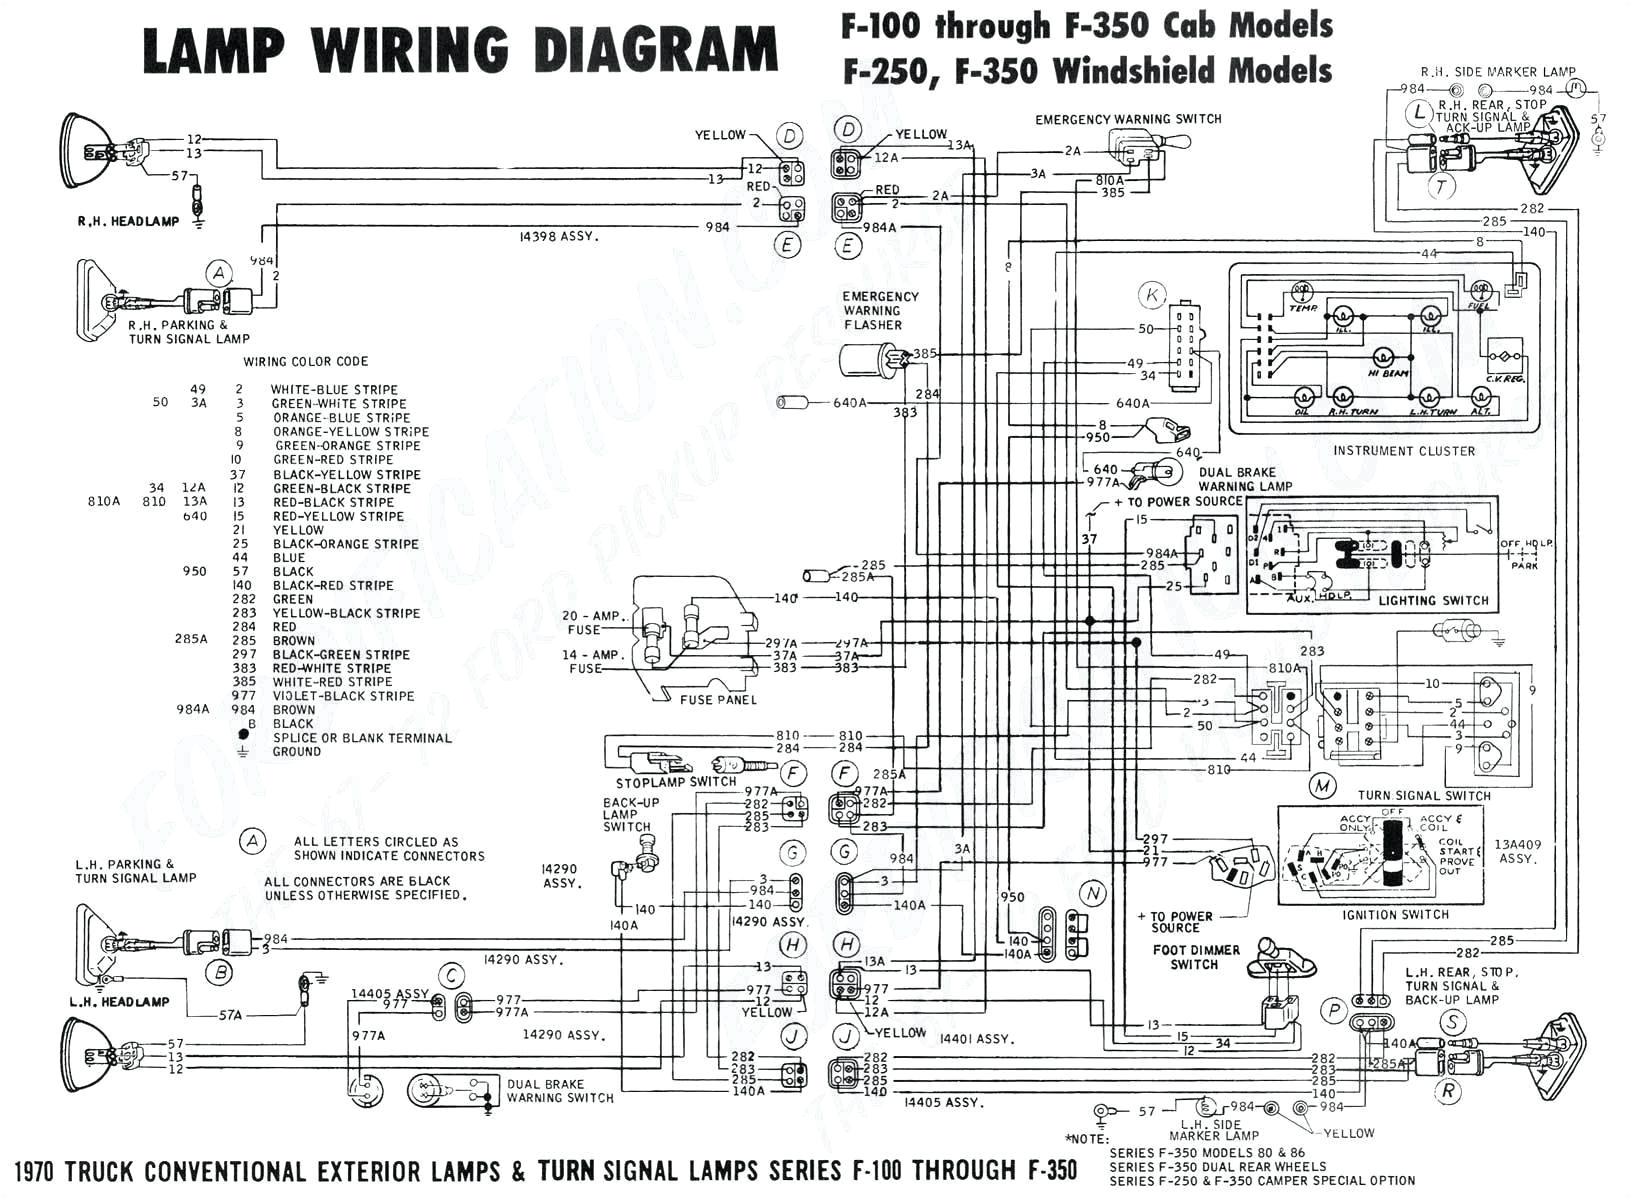 kenworth pto wiring diagram wiring diagram new kenworth pto wiring diagram